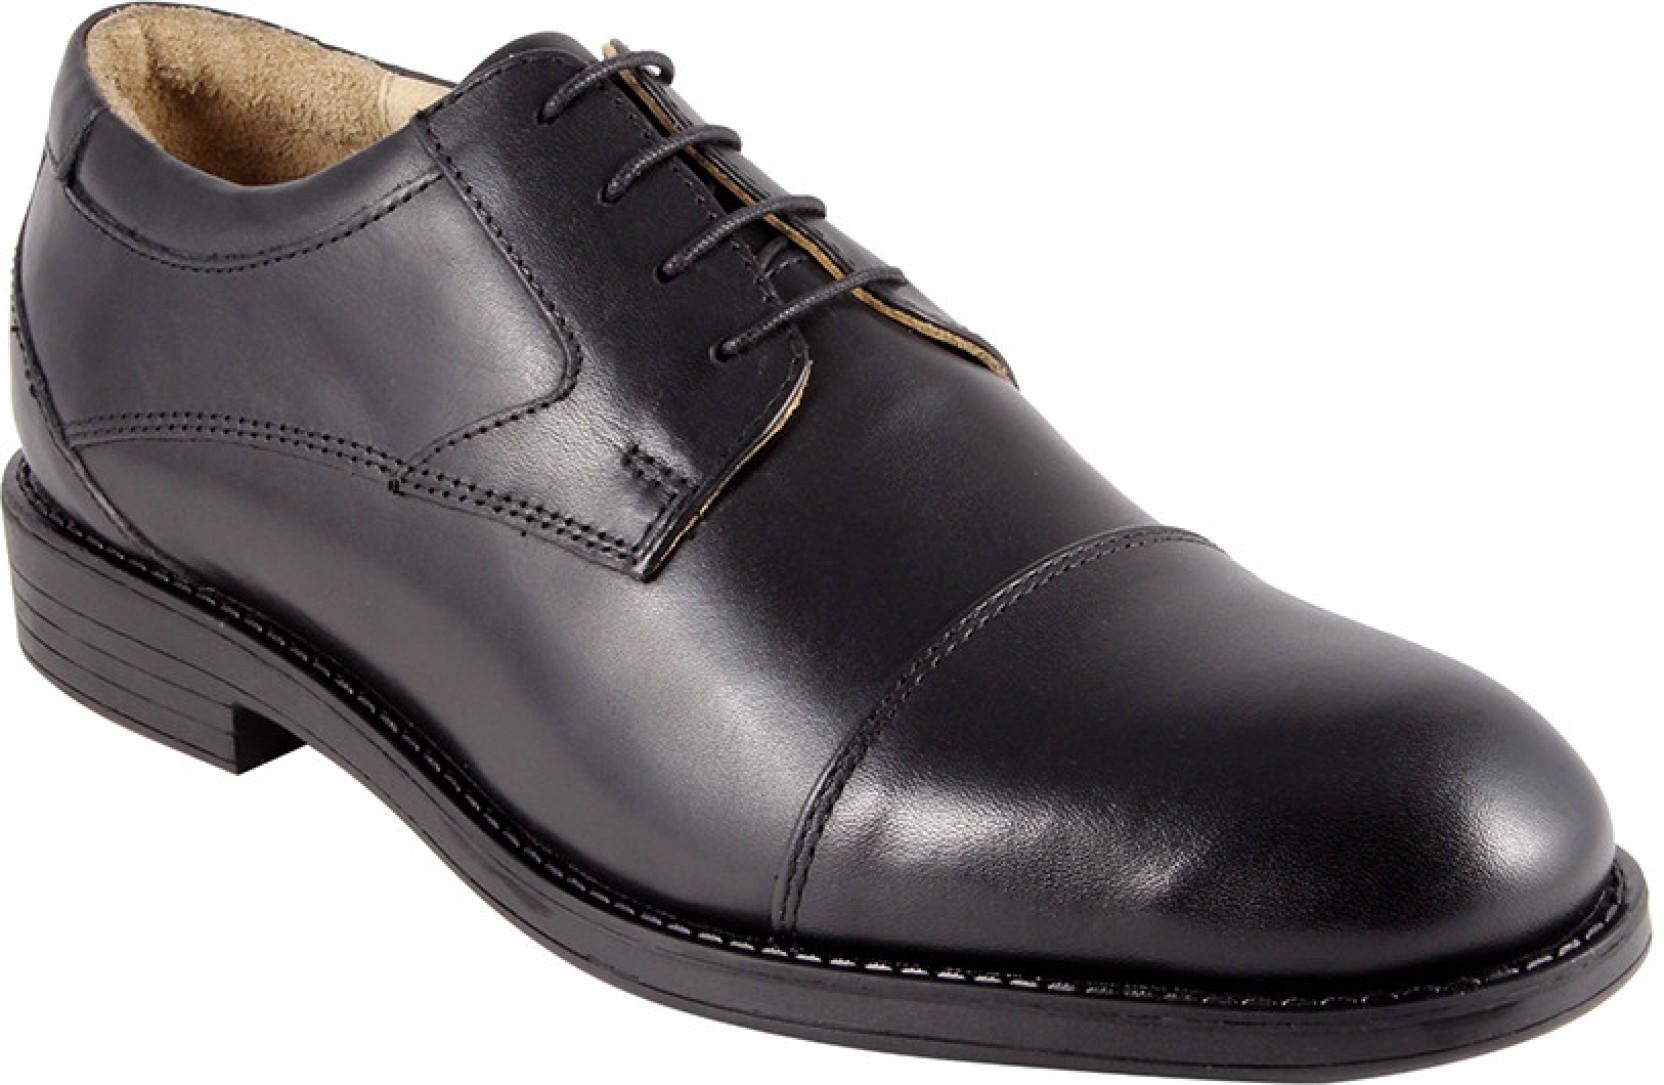 Tred Flex Mens Lace Up Shoes For Men Buy Black Color Uc Big Diwali Sale Ends In01 Days 18 Hrs 29 Mins 40 Secs